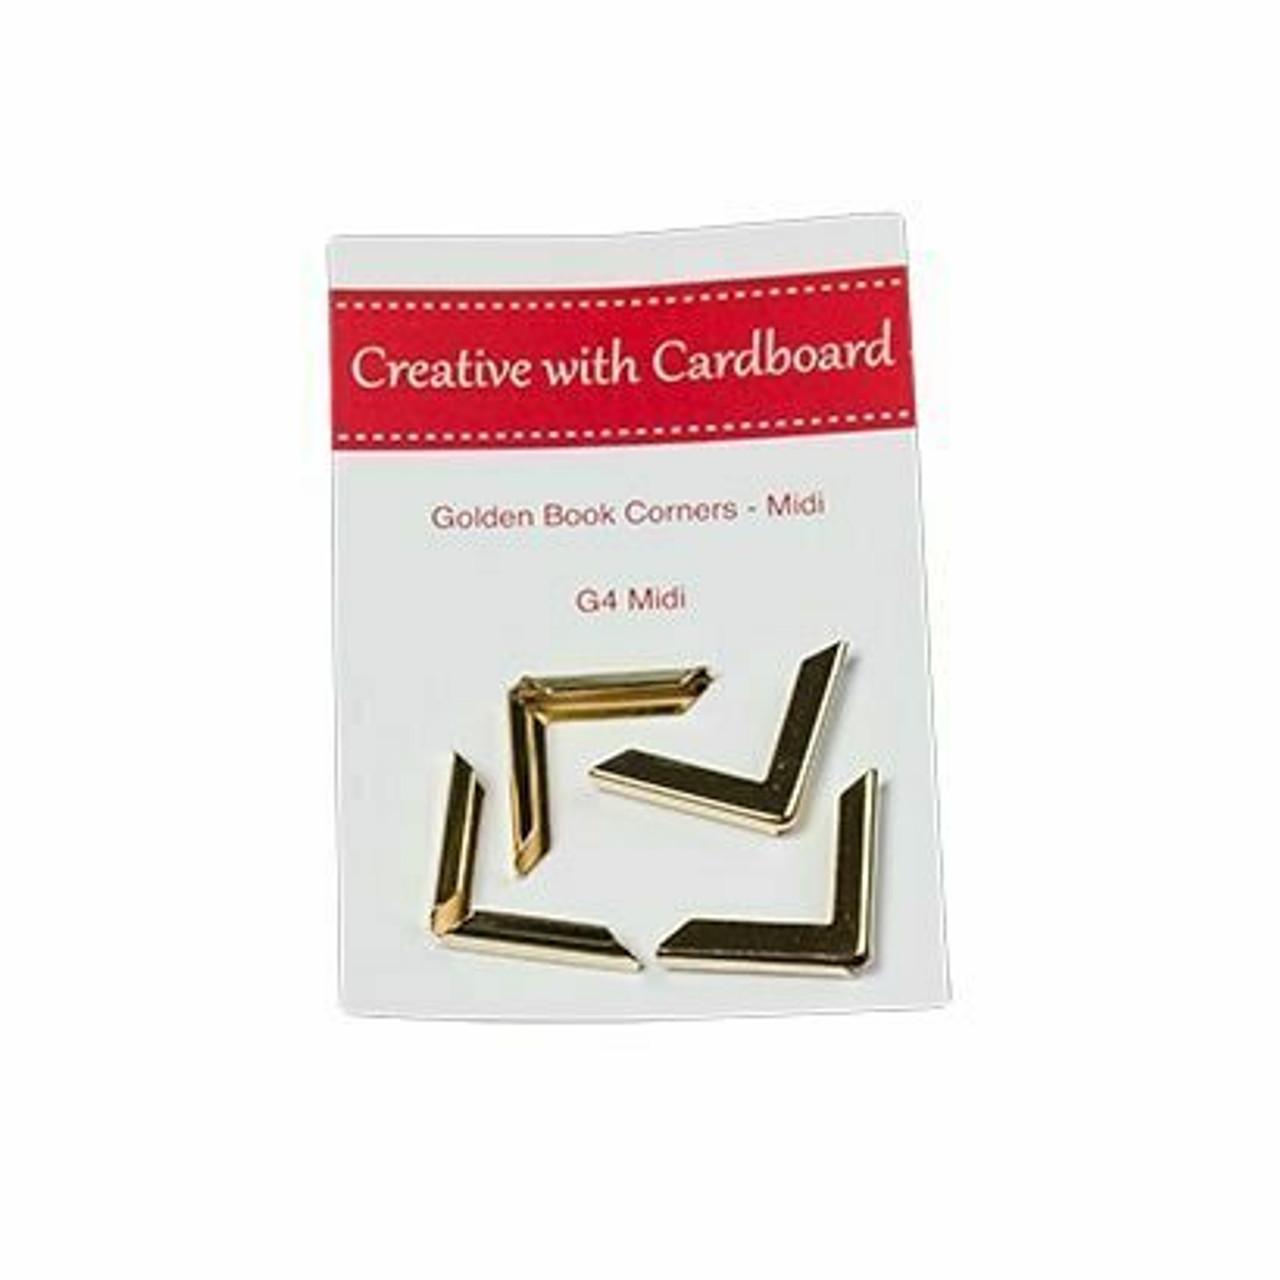 Rinske Stevens Designs: Golden Book Corners Midi